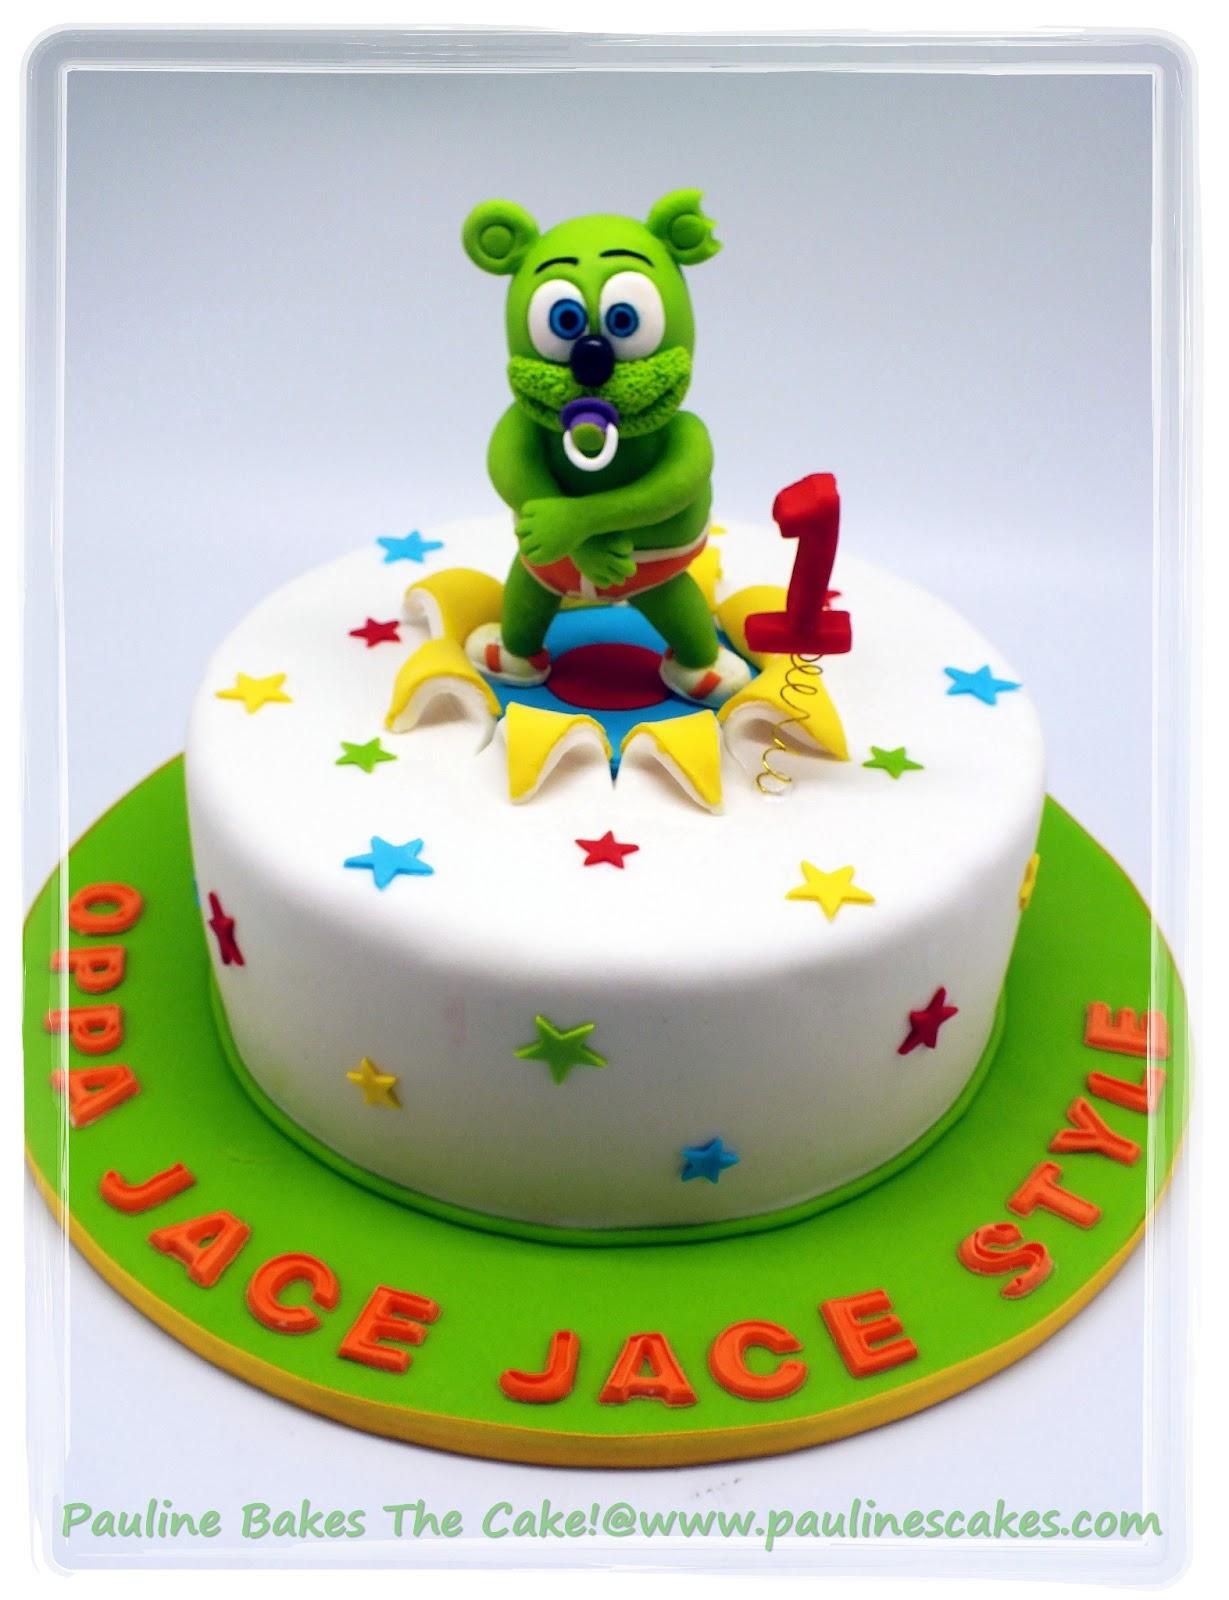 Pauline Bakes The Cake Gummy Bear Gangnam Style Cake